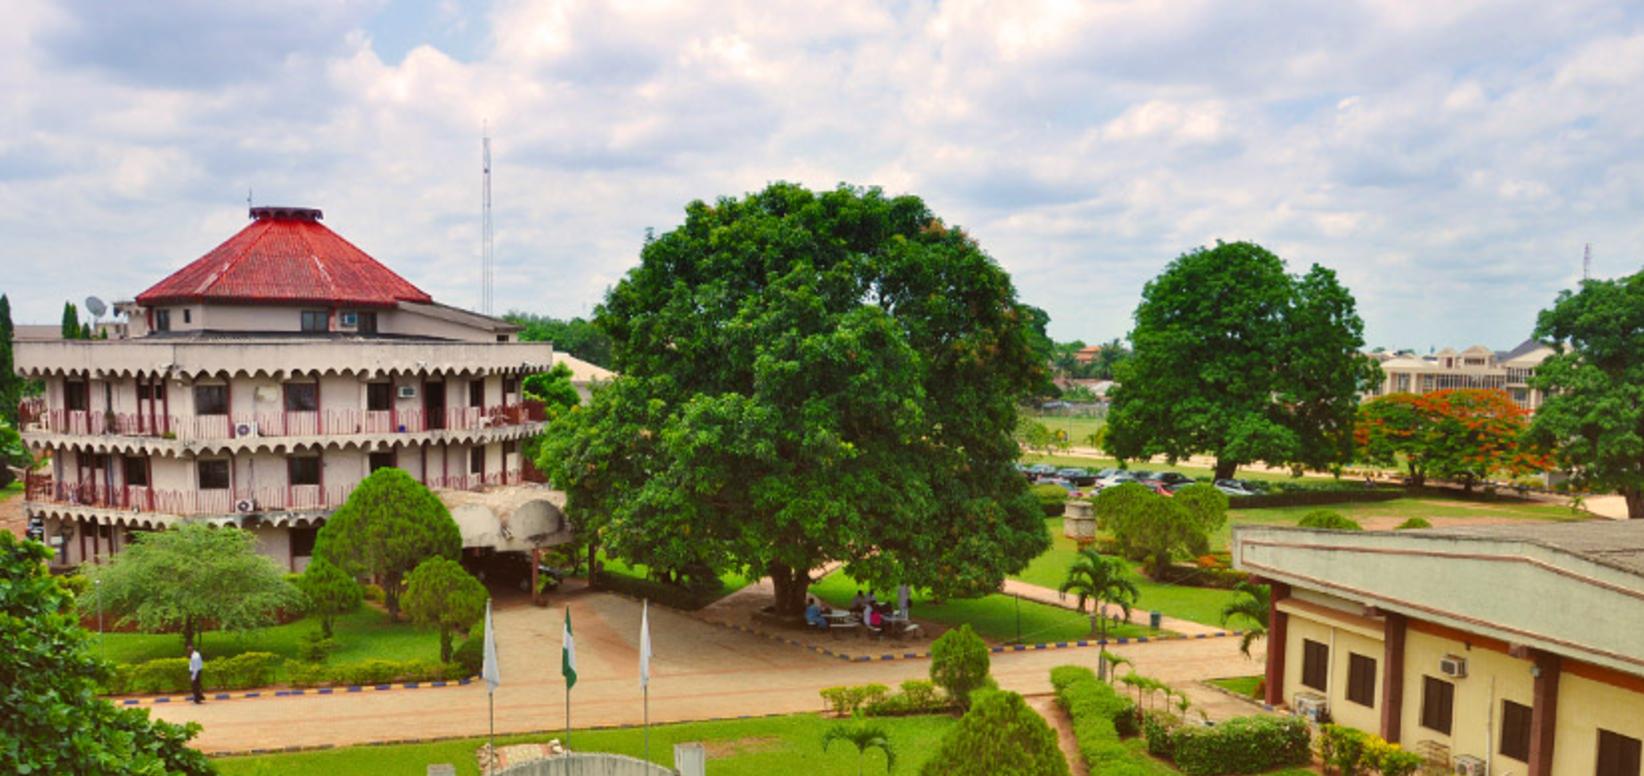 Benson Idahosa University en Benin City, Nigeria